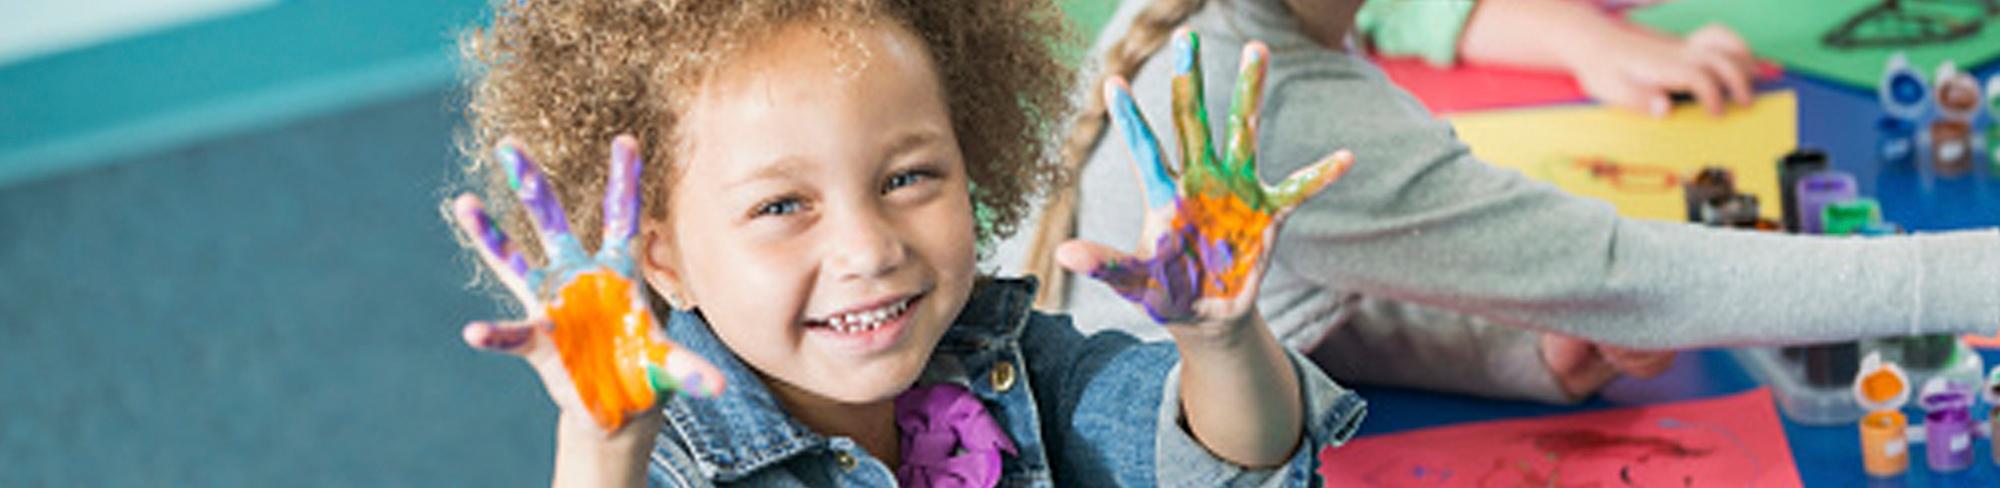 Rosemead Early Education